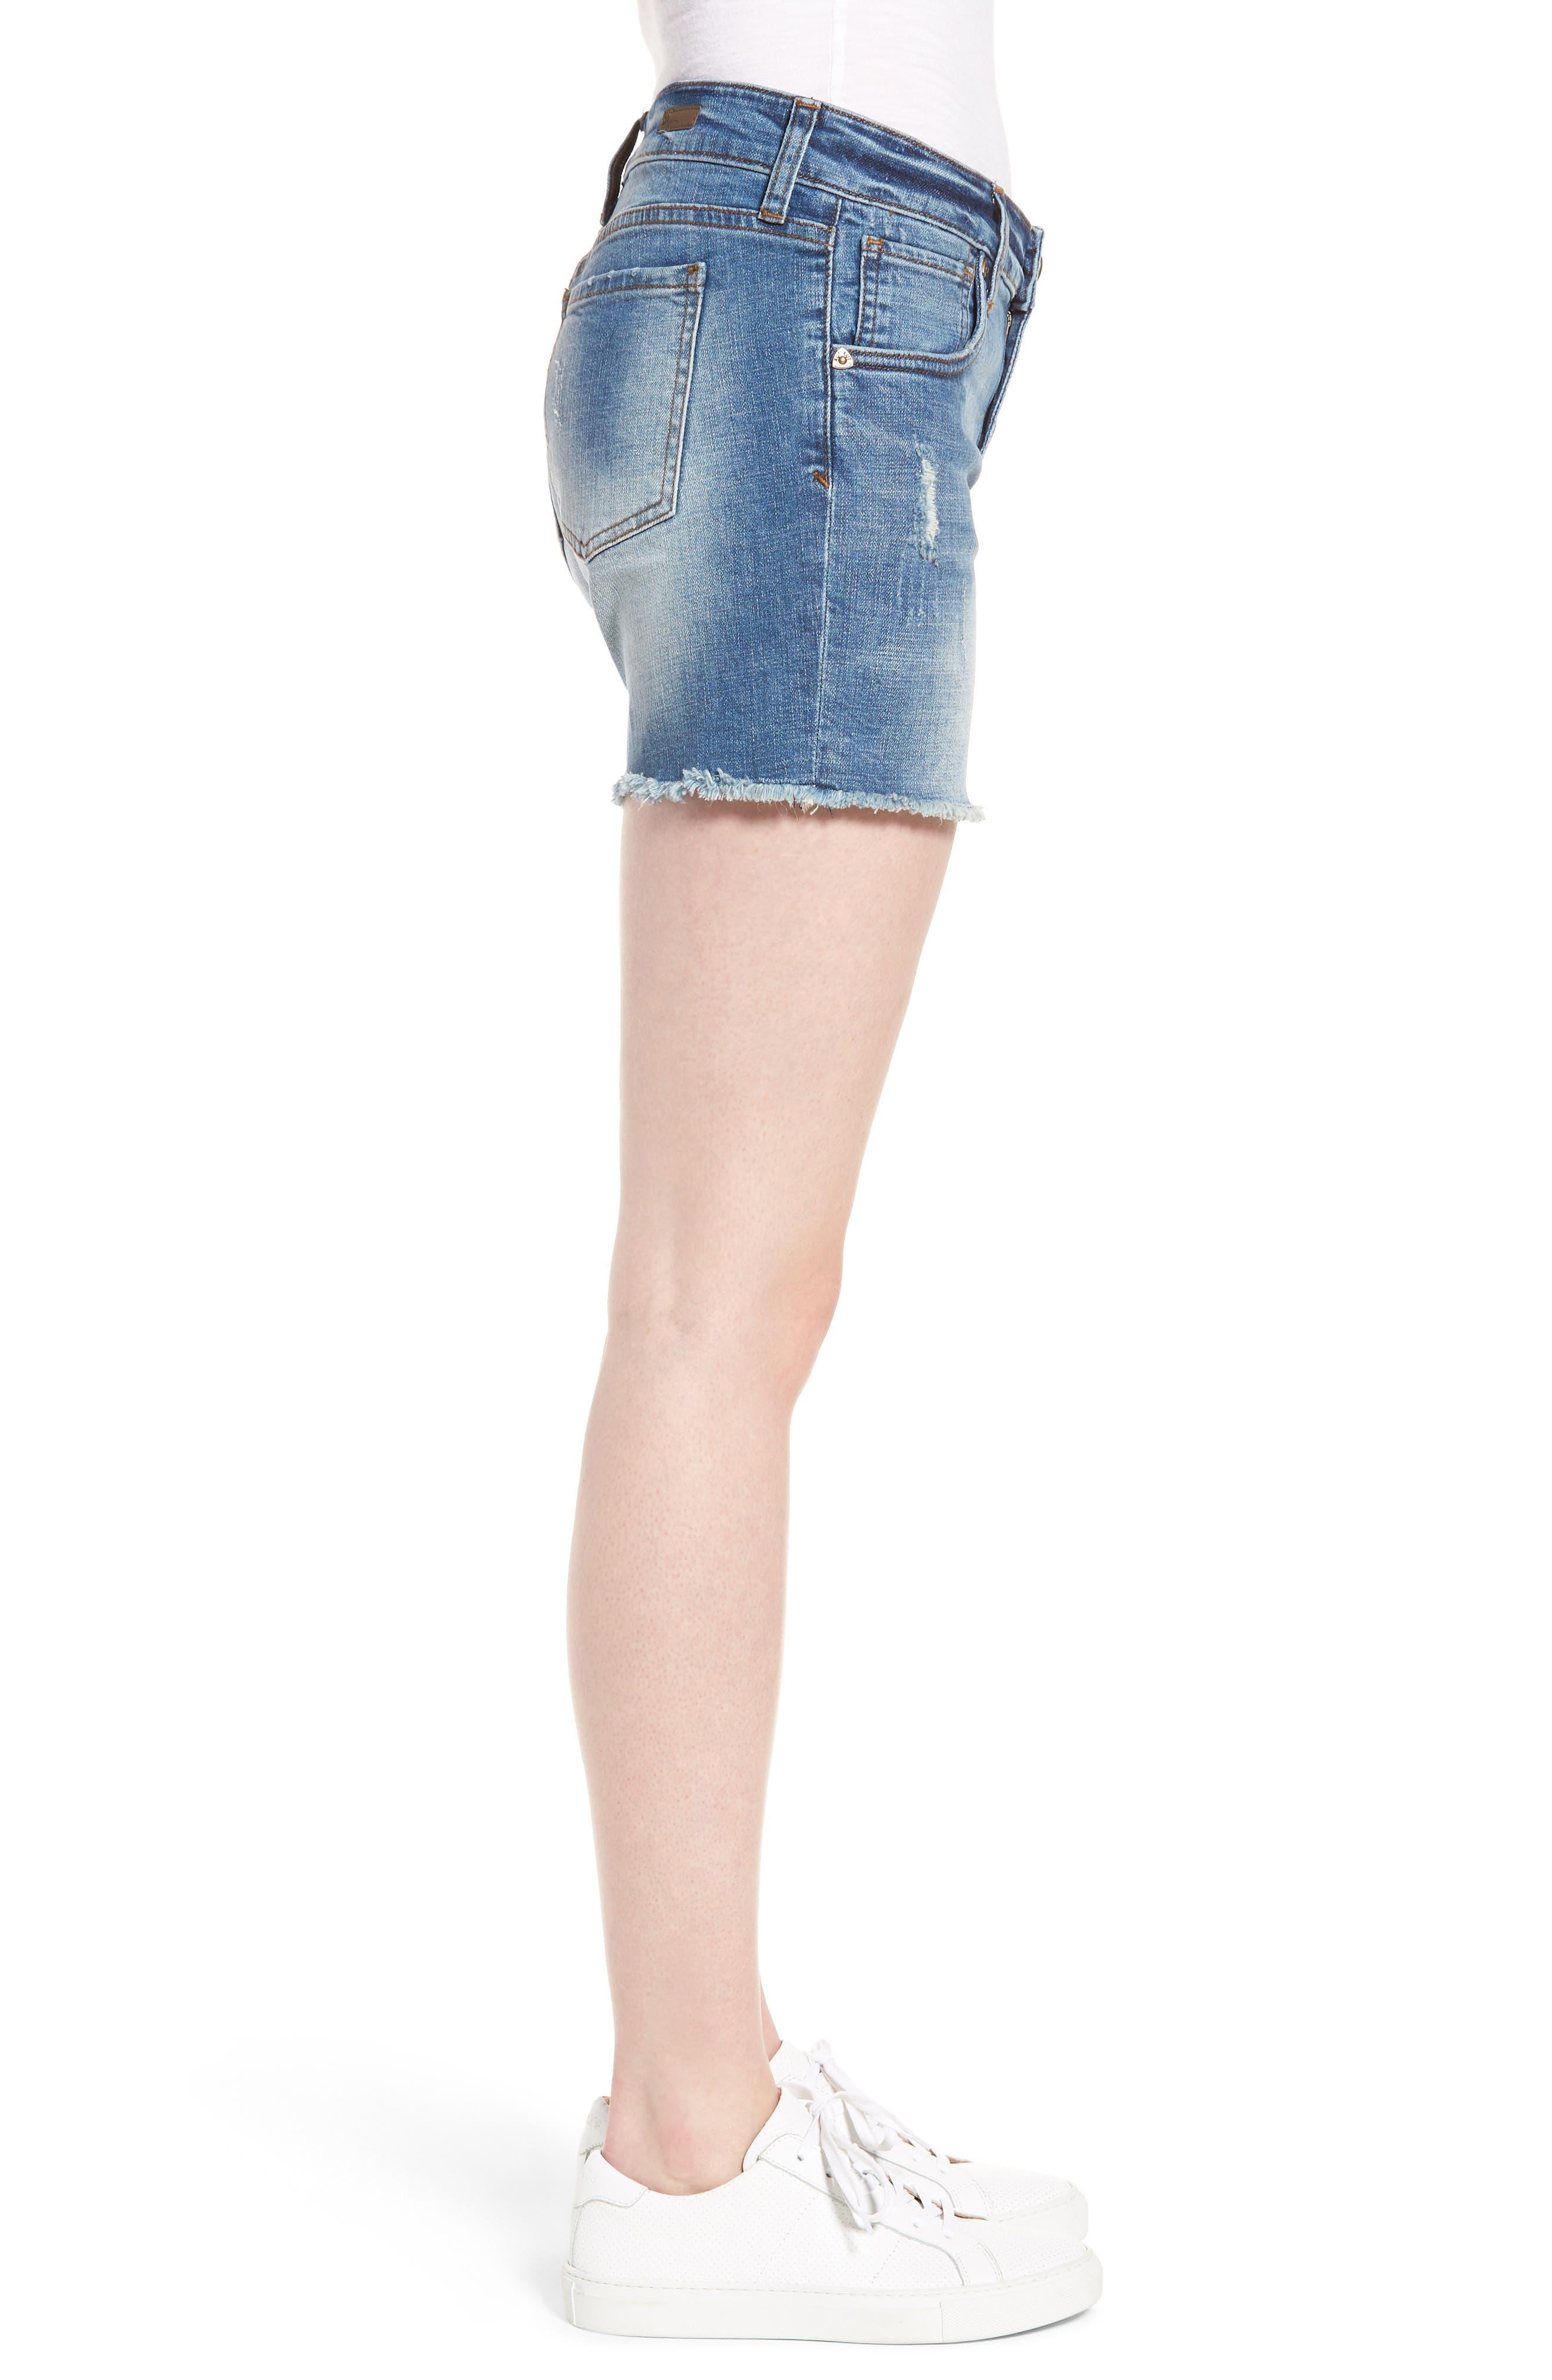 Gidget Distressed Denim Shorts,                             Alternate thumbnail 3, color,                             Constructive